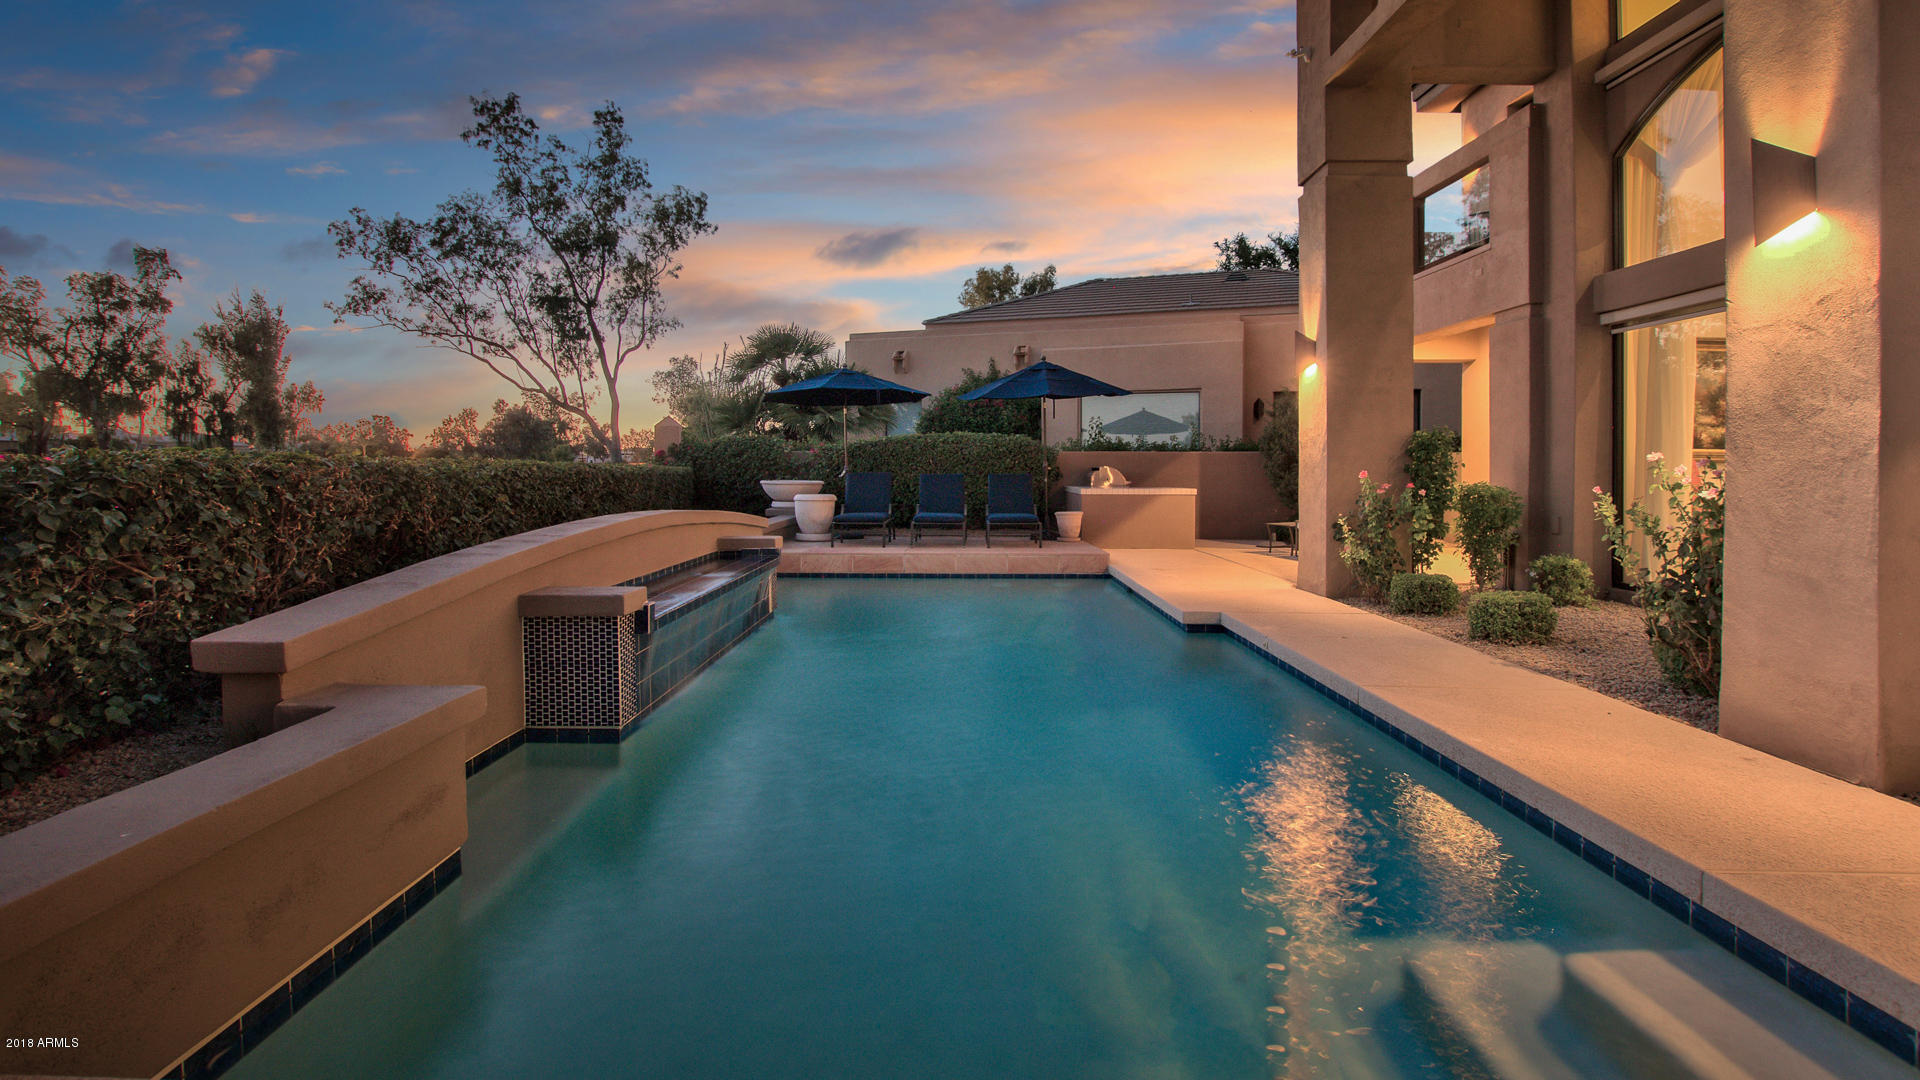 MLS 5823536 7425 E GAINEY RANCH Road Unit 17, Scottsdale, AZ 85258 Scottsdale AZ Gated